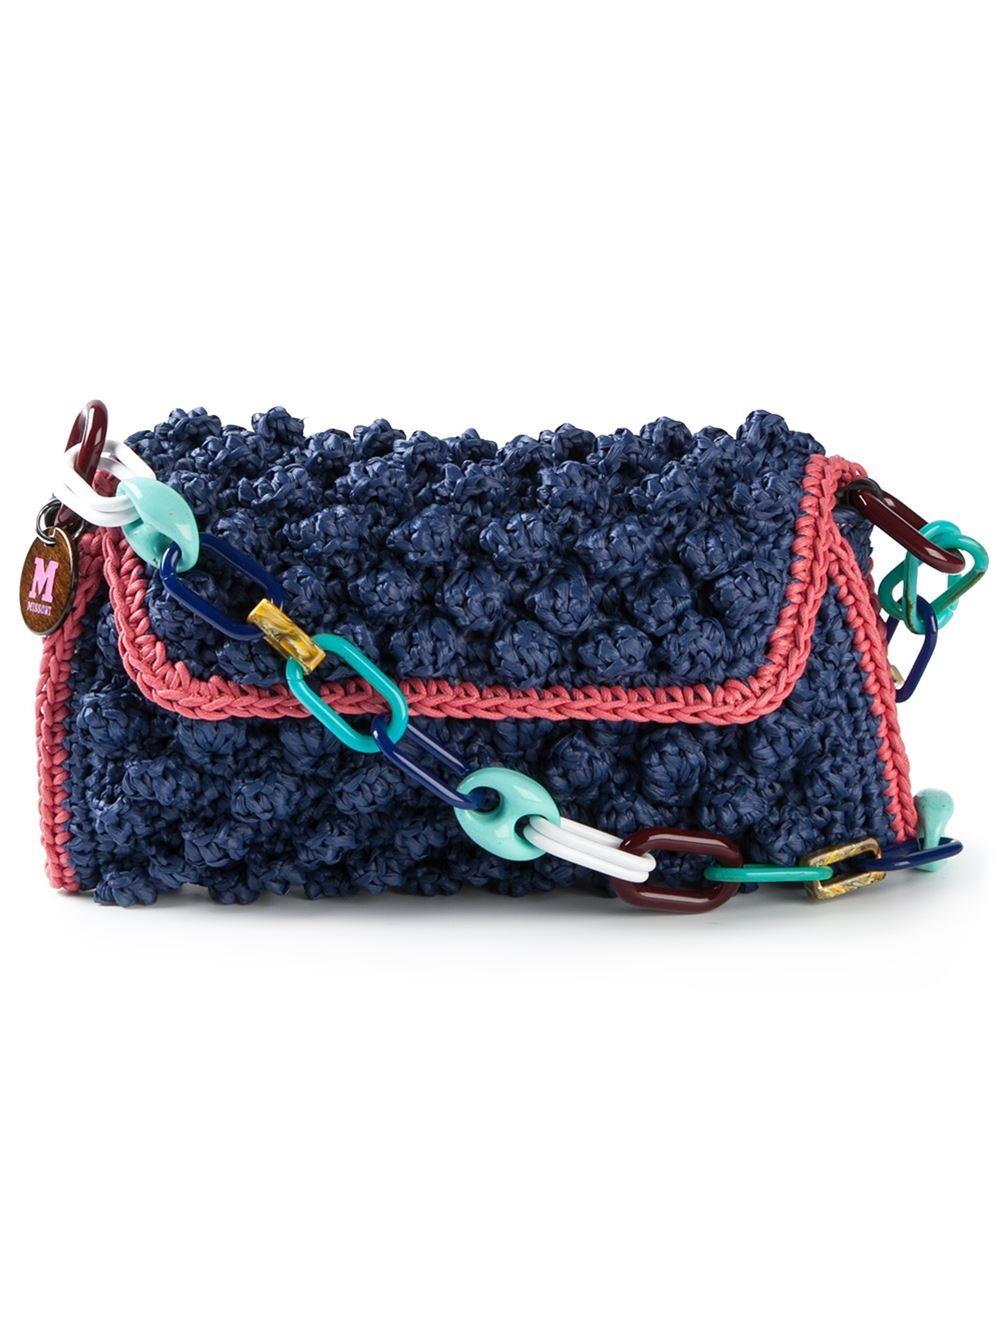 M Missoni Boucl 233 Knit Shoulder Bag In Blue Lyst